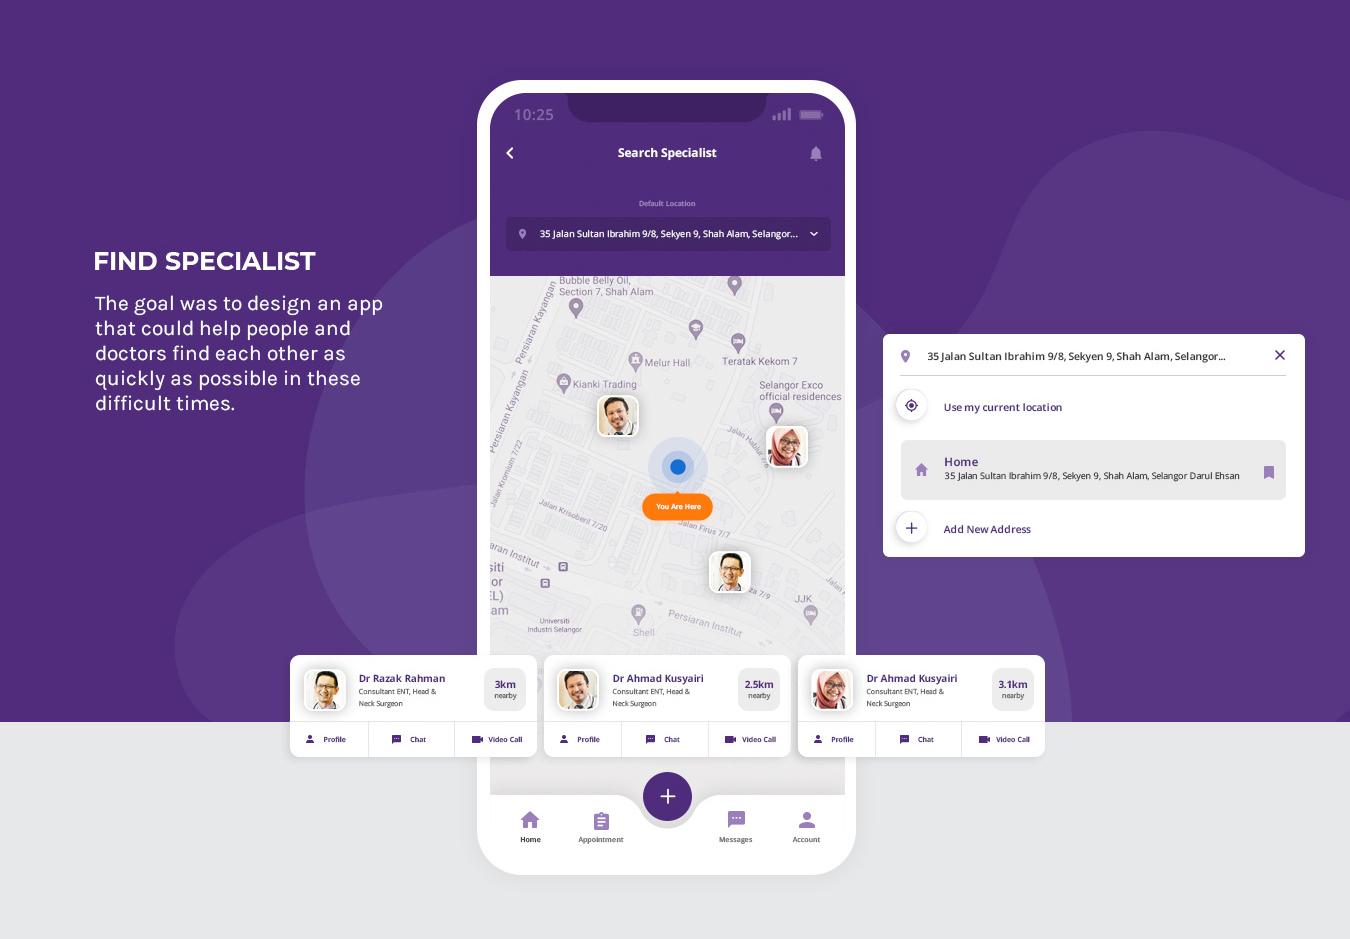 TrueCare2U - Mobile Application - Find Specialist